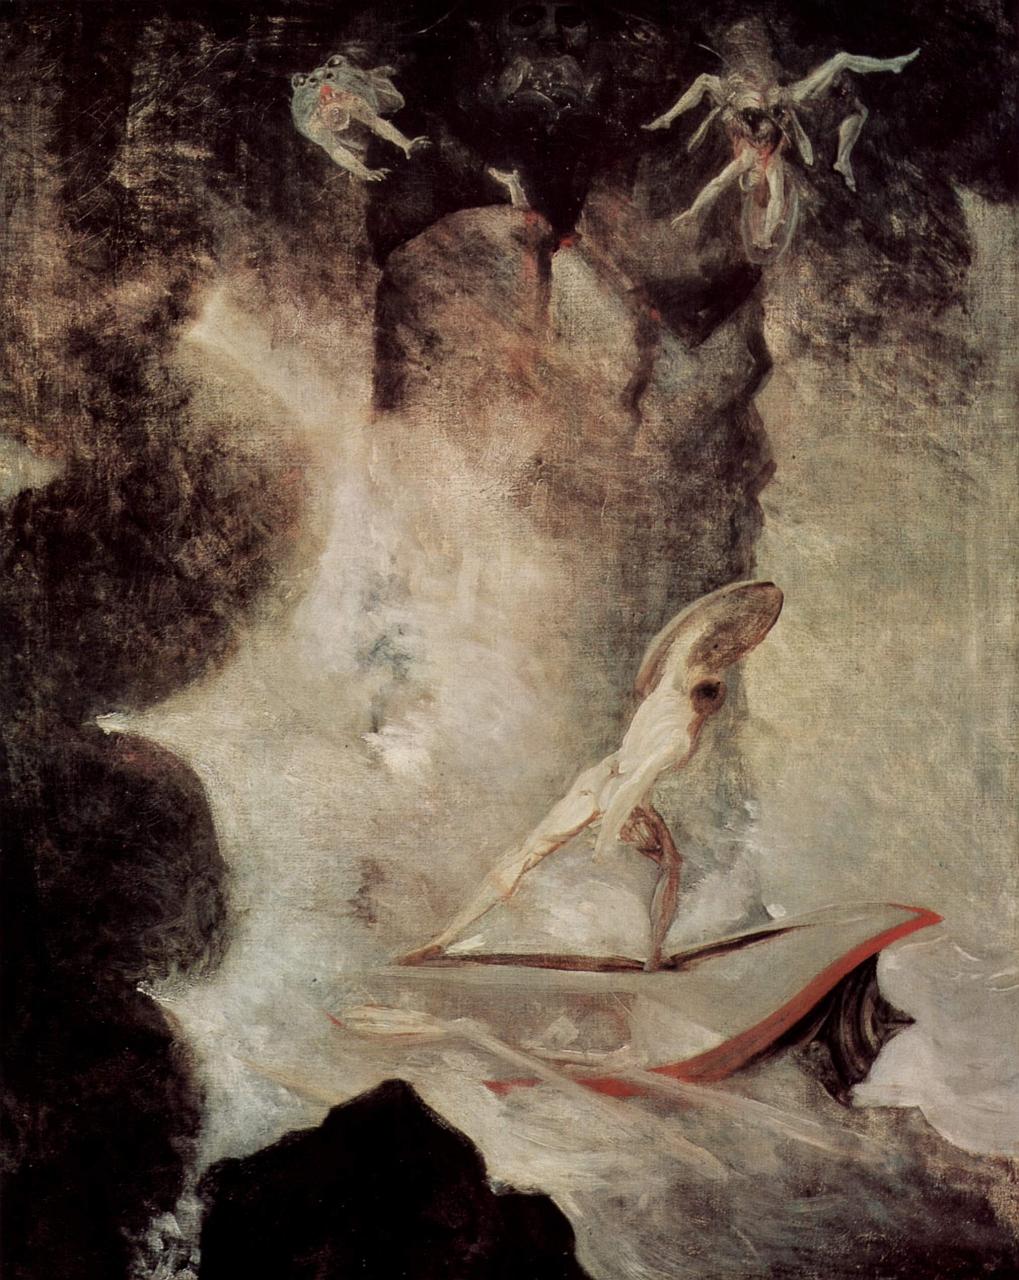 Odysseus And Scylla Of Scylla and Charybdi...